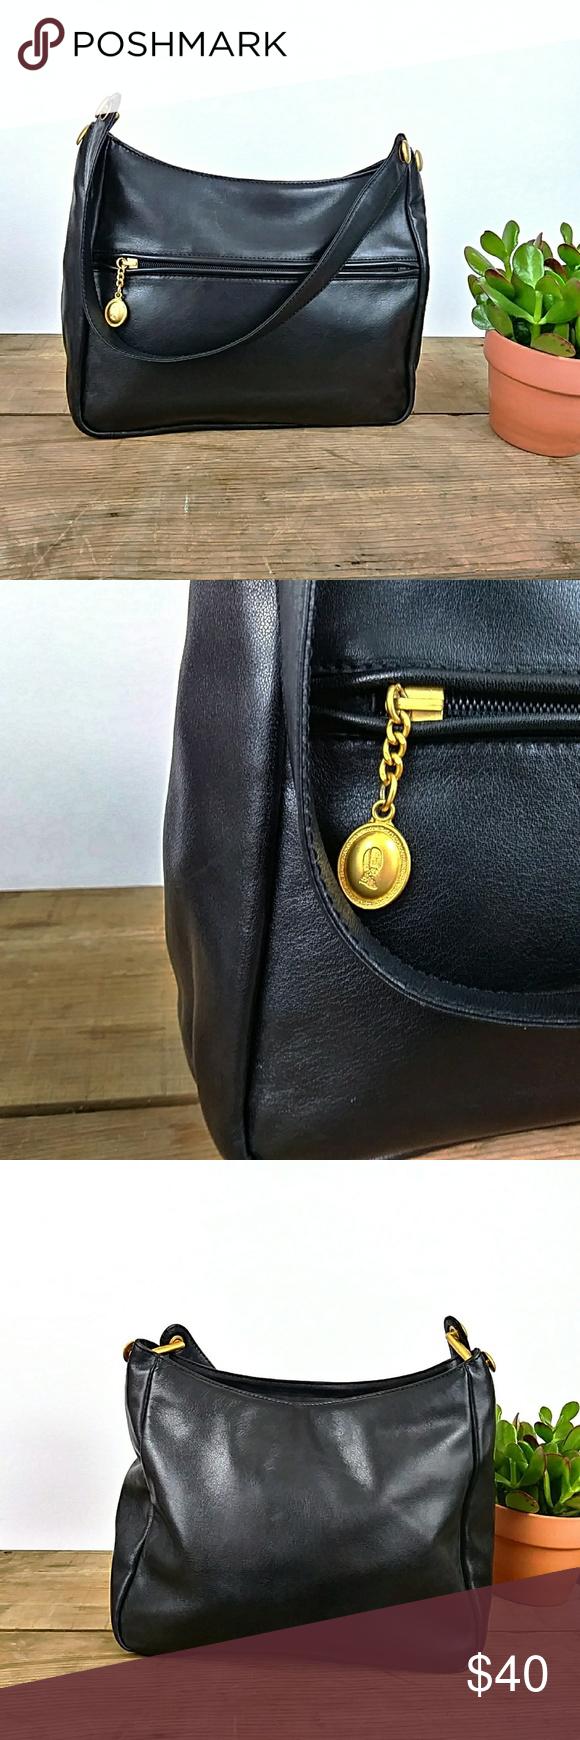 Saint Jack London Small Soft Leather Bag Soft Leather Bag Black Leather Bags Bags